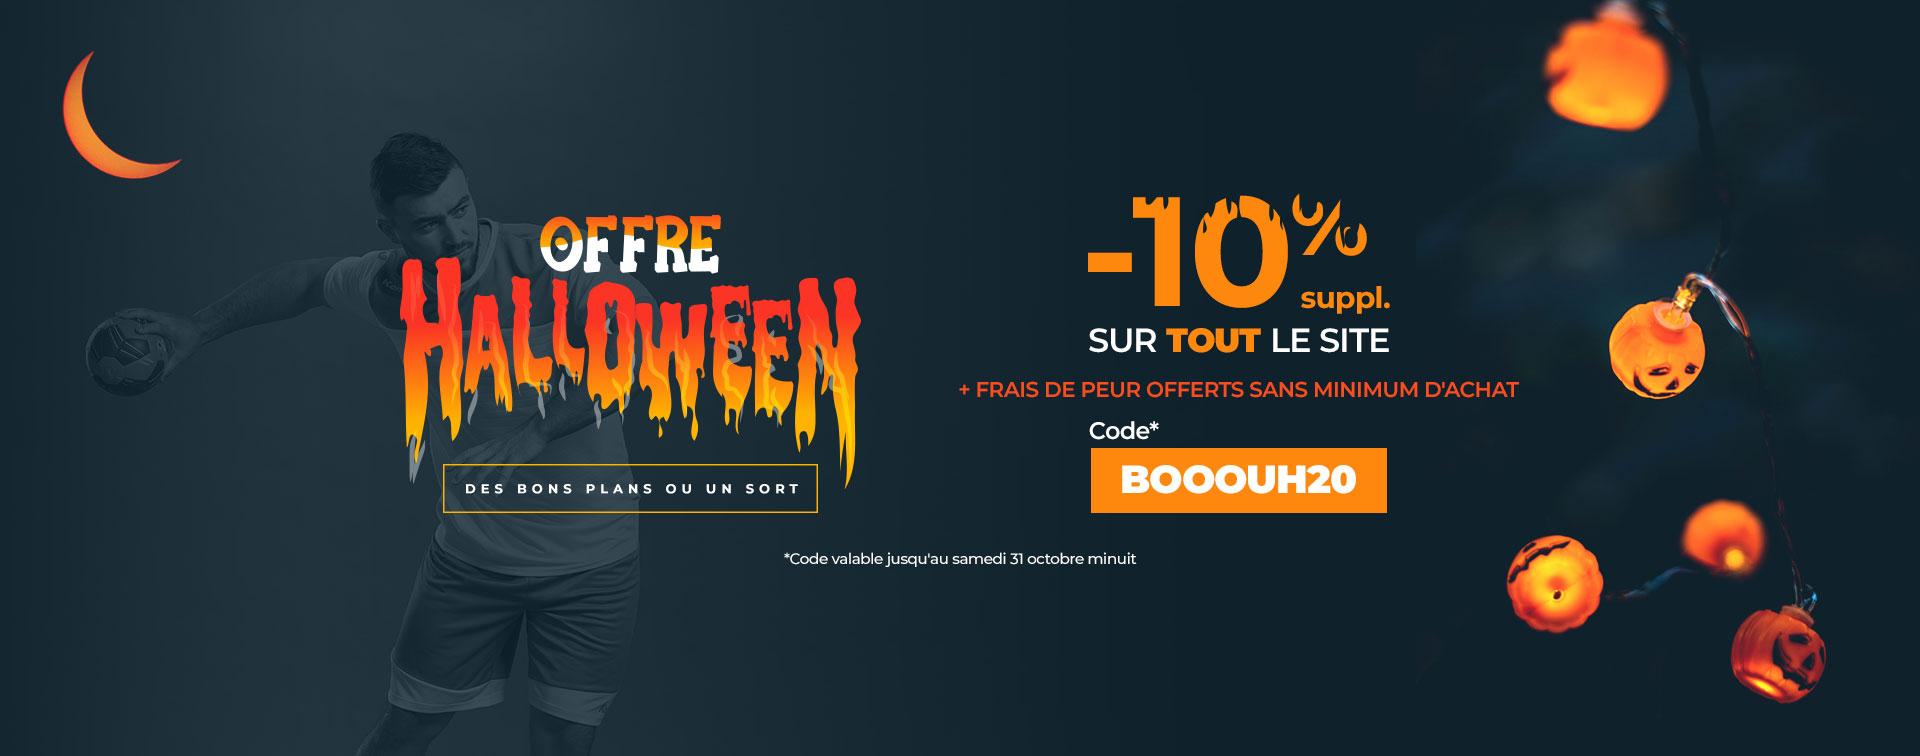 Offre Halloween -10% suppl. et livraison offerte